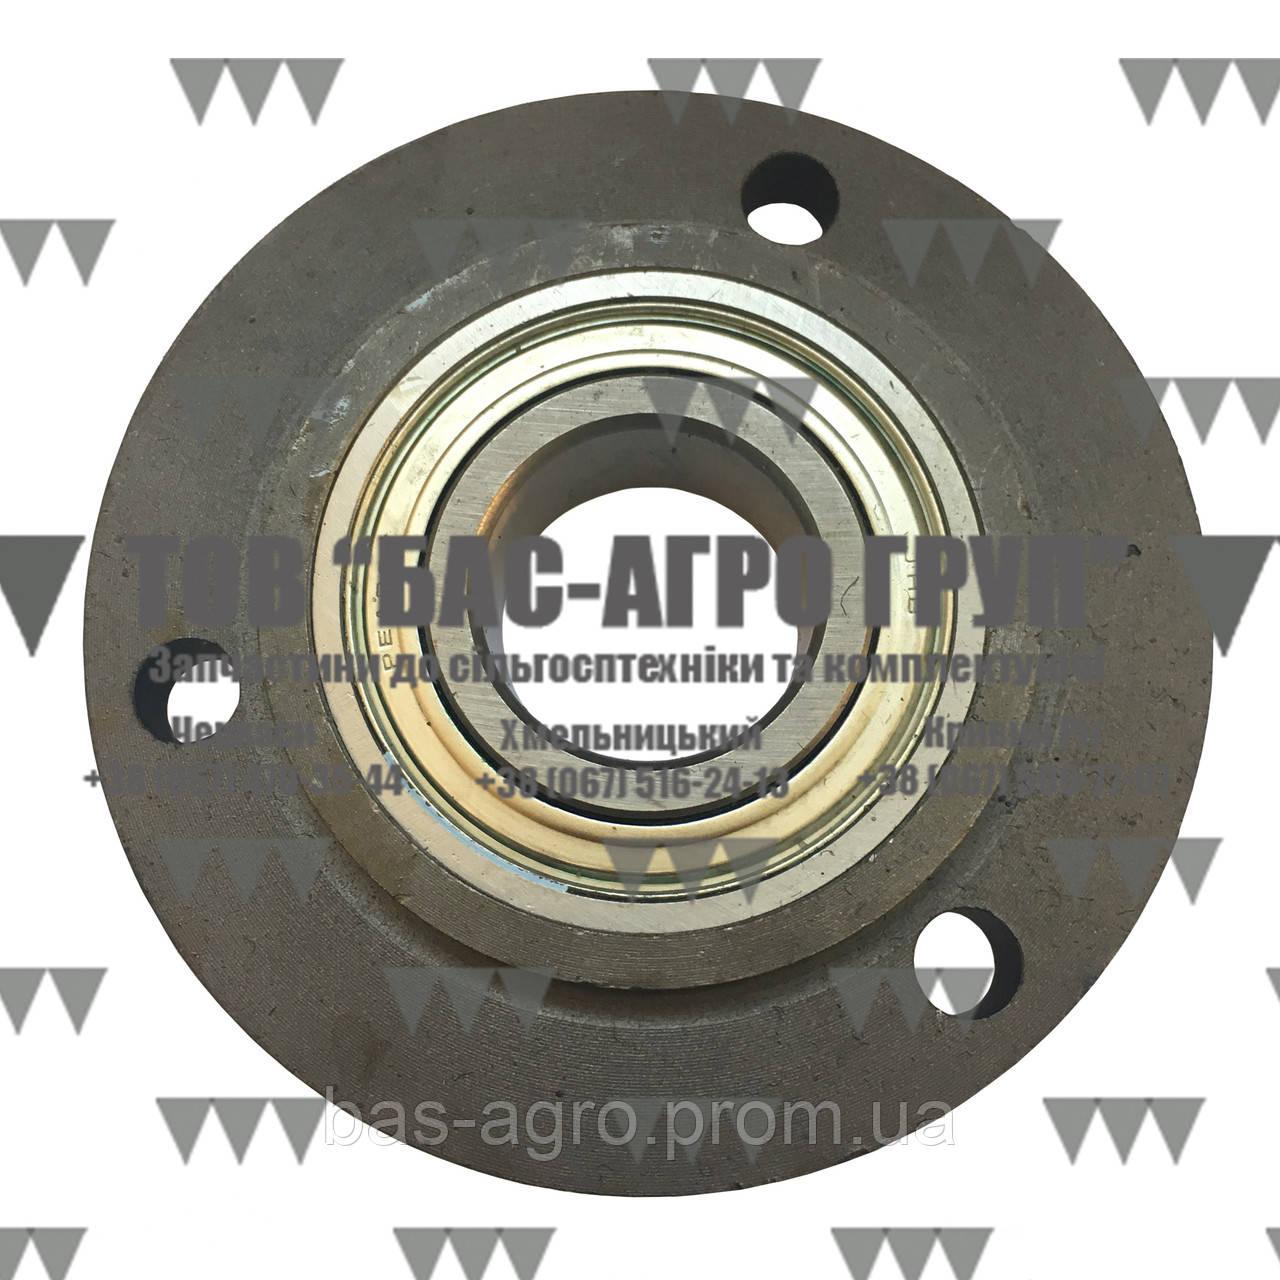 Подшипниковый узел 603144.0 Claas аналог